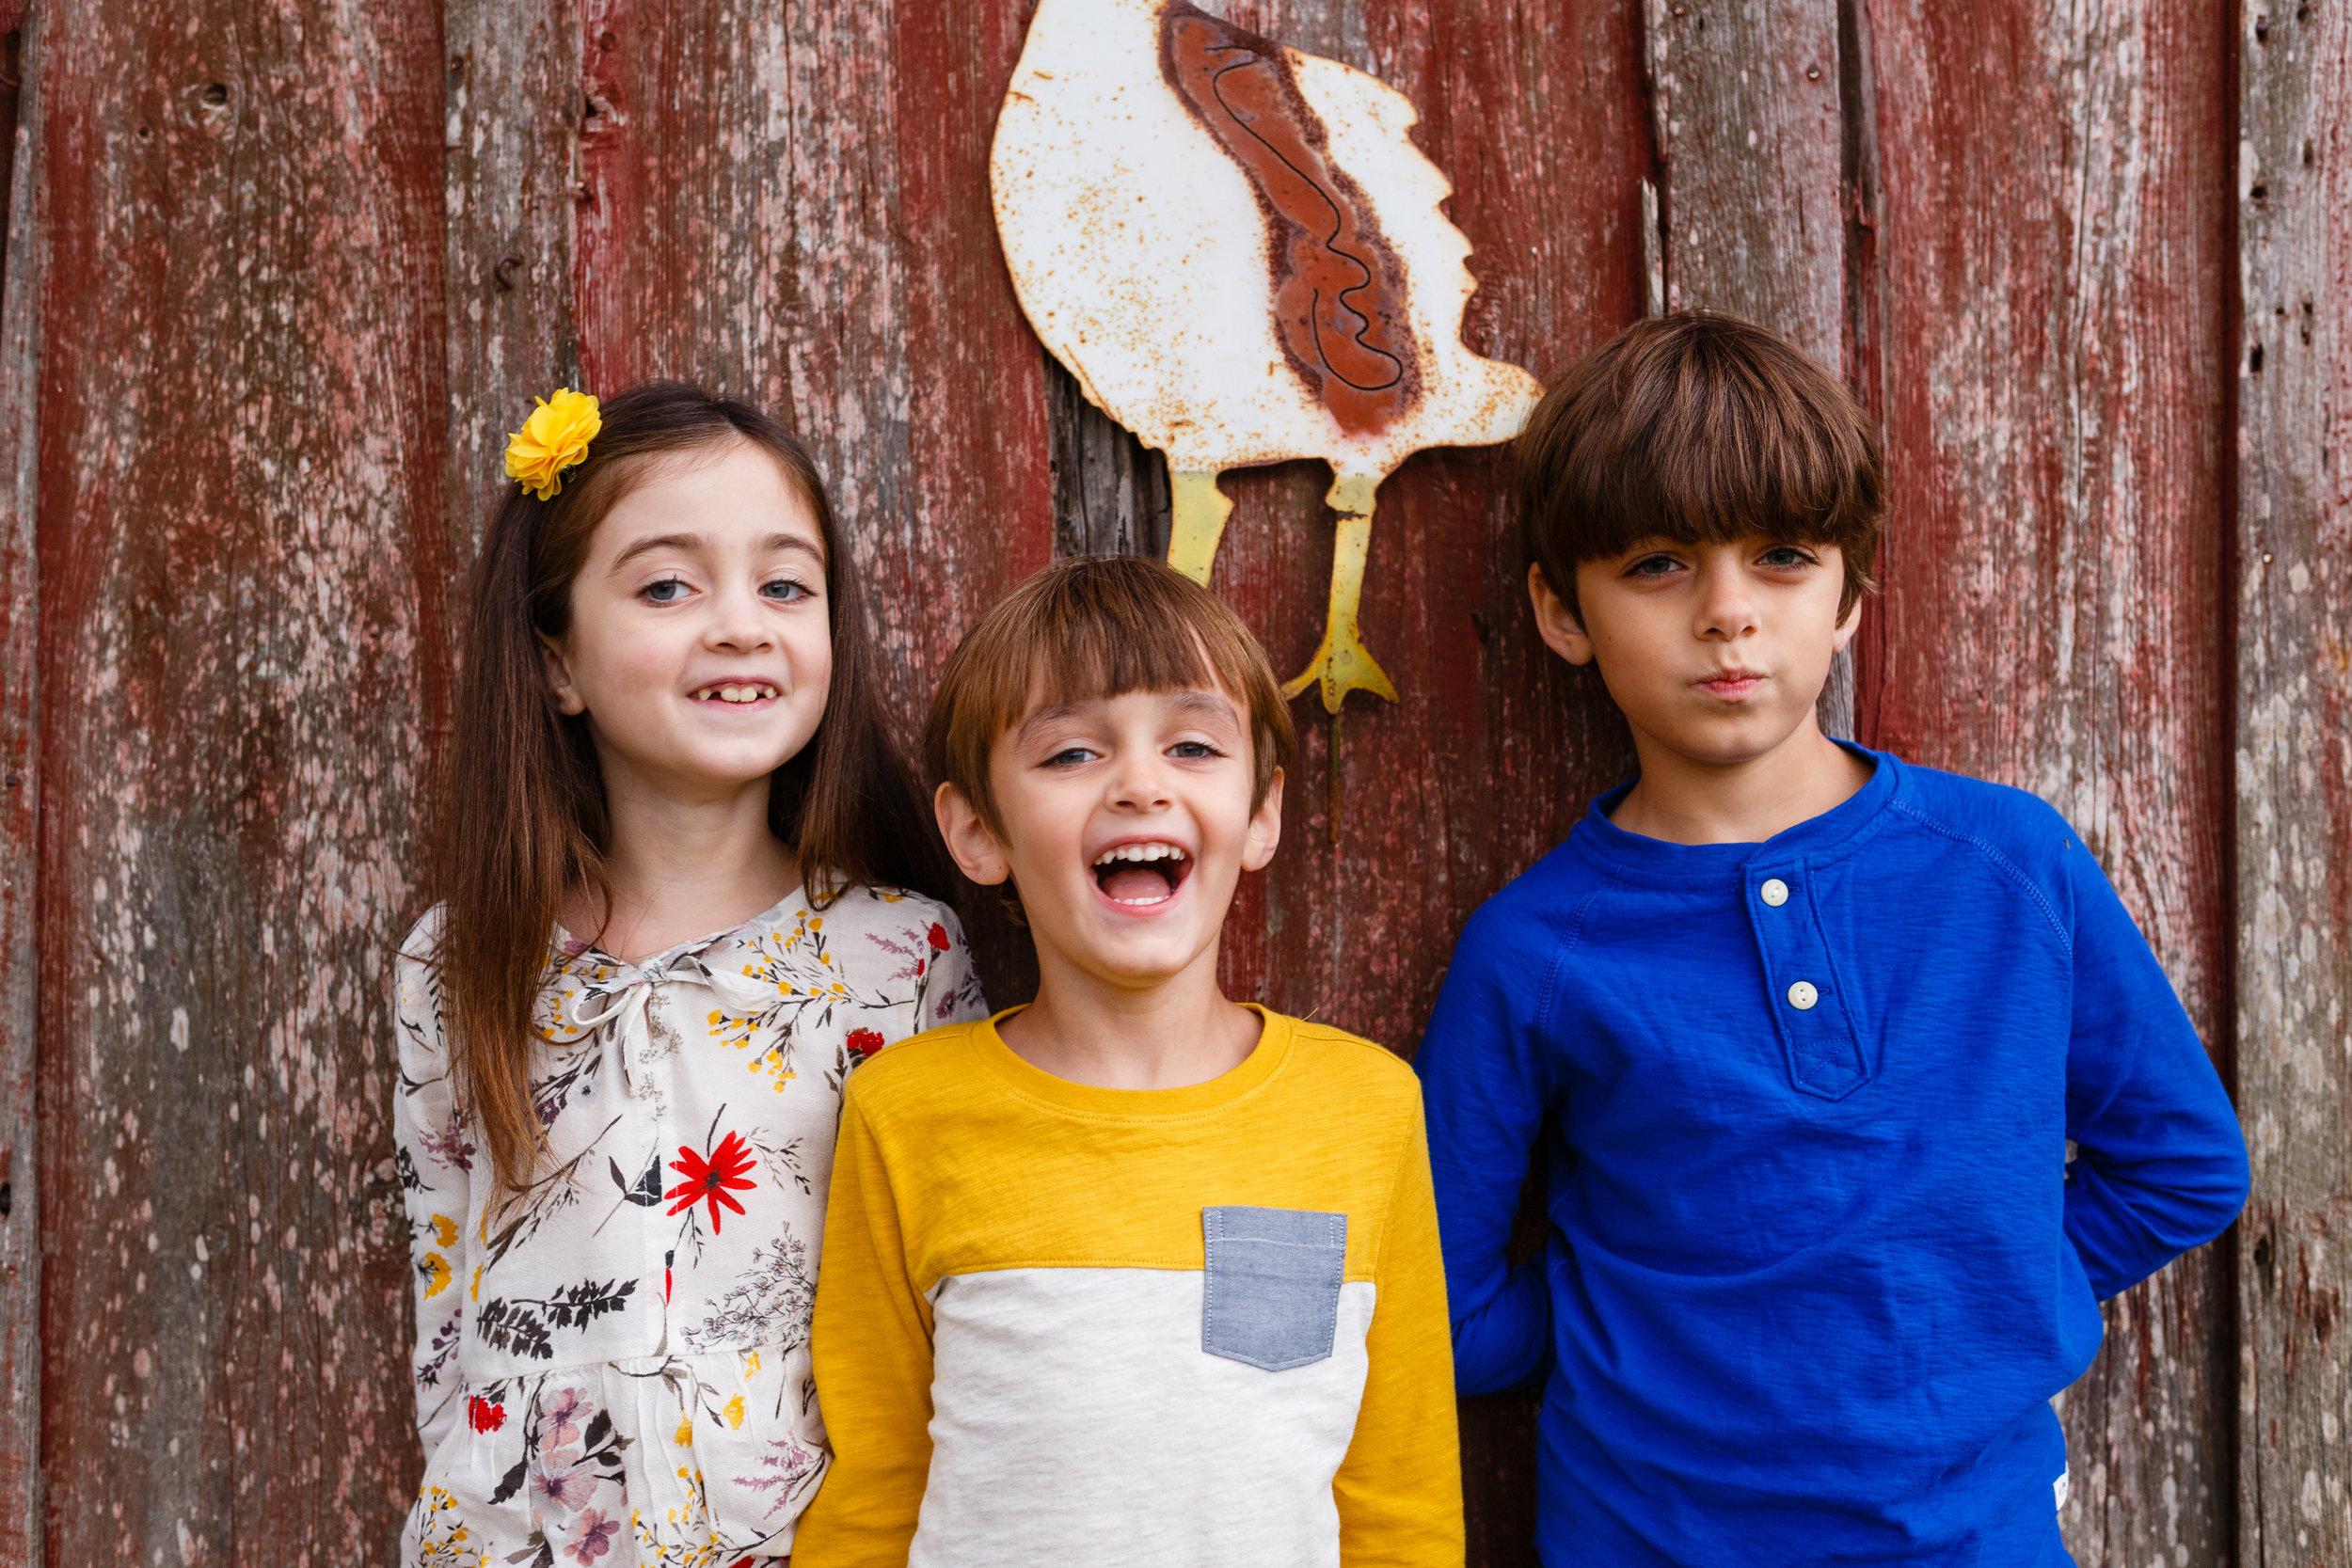 Family-child-portrait-lafayette-broussard-youngsville-photographer-10.jpg